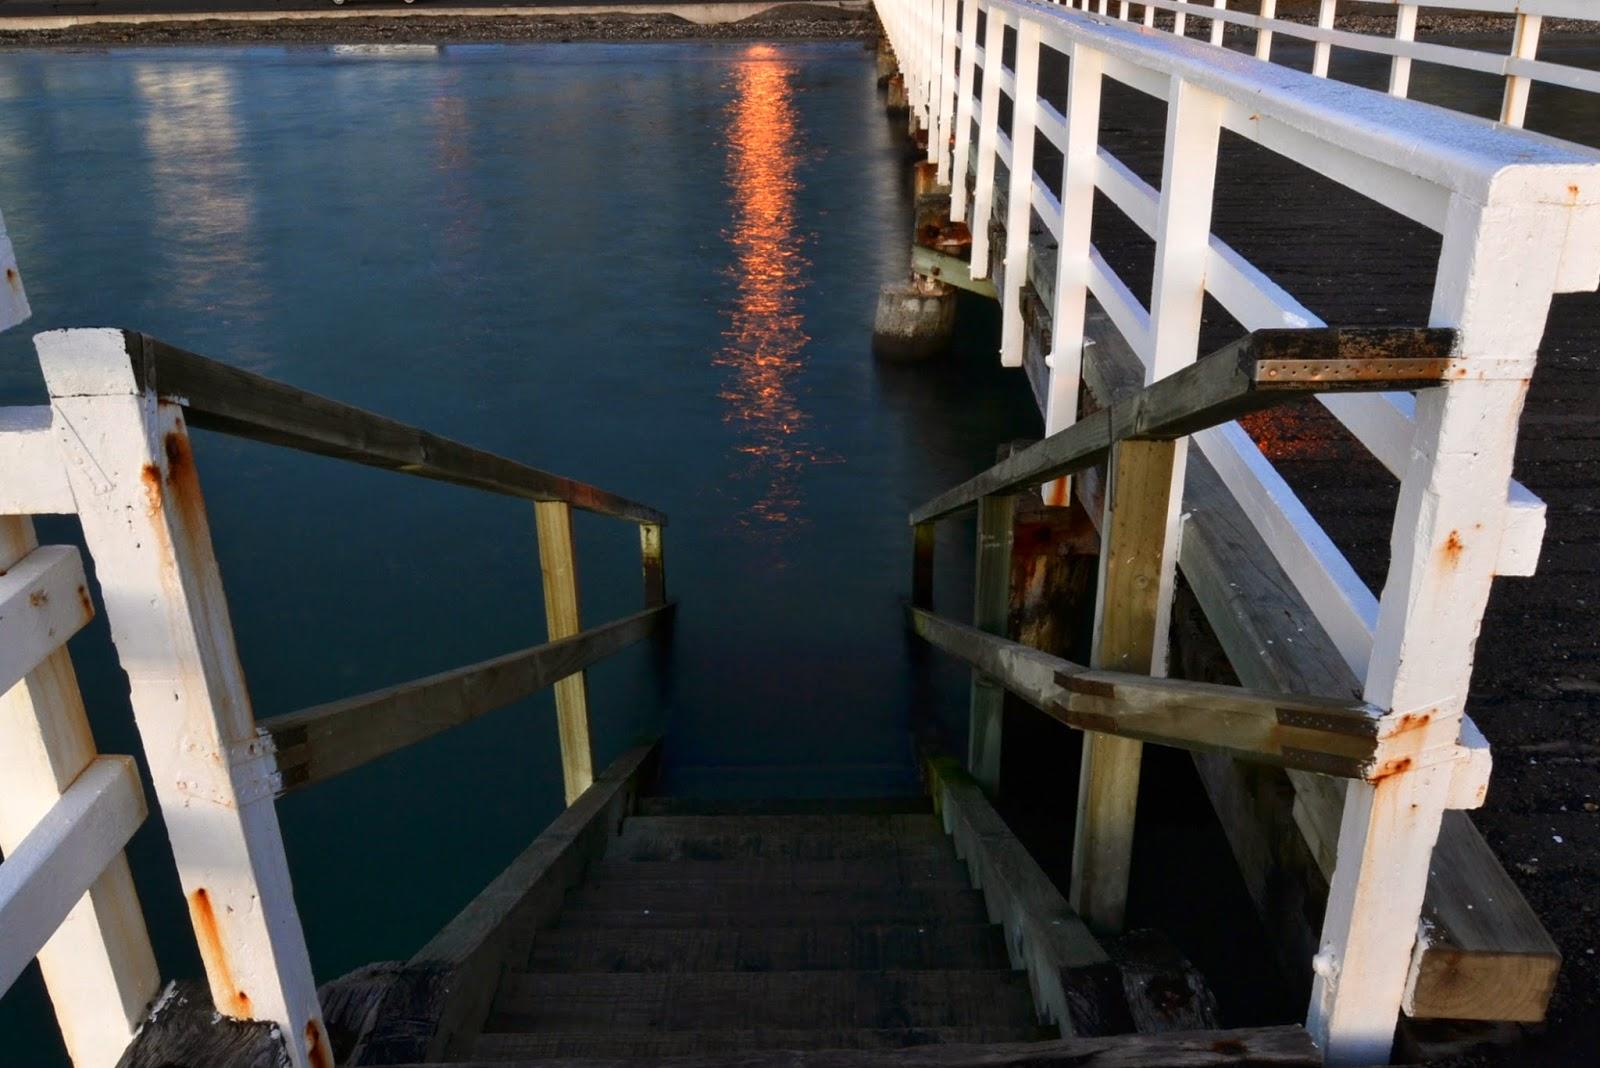 Seatoun Pier